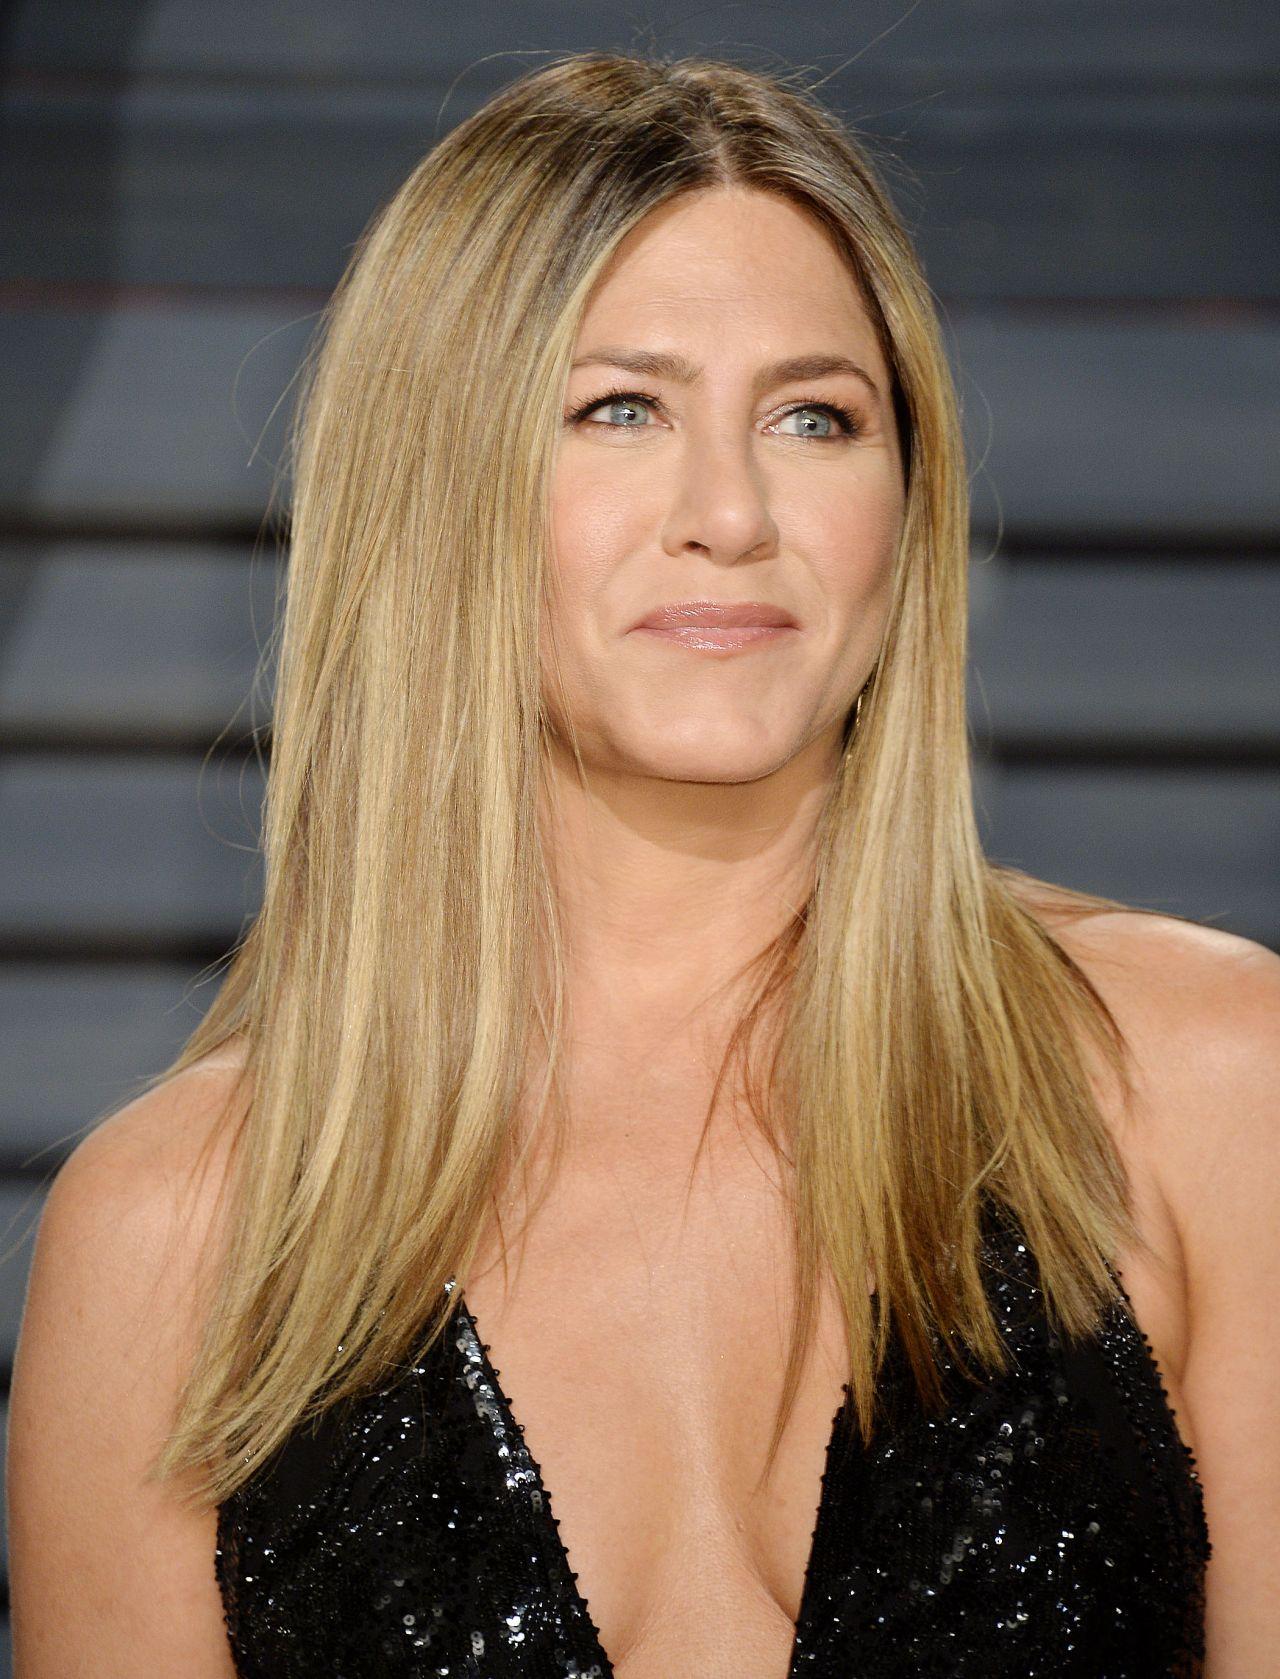 Jennifer Aniston At Vanity Fair Oscar 2017 Party In Los